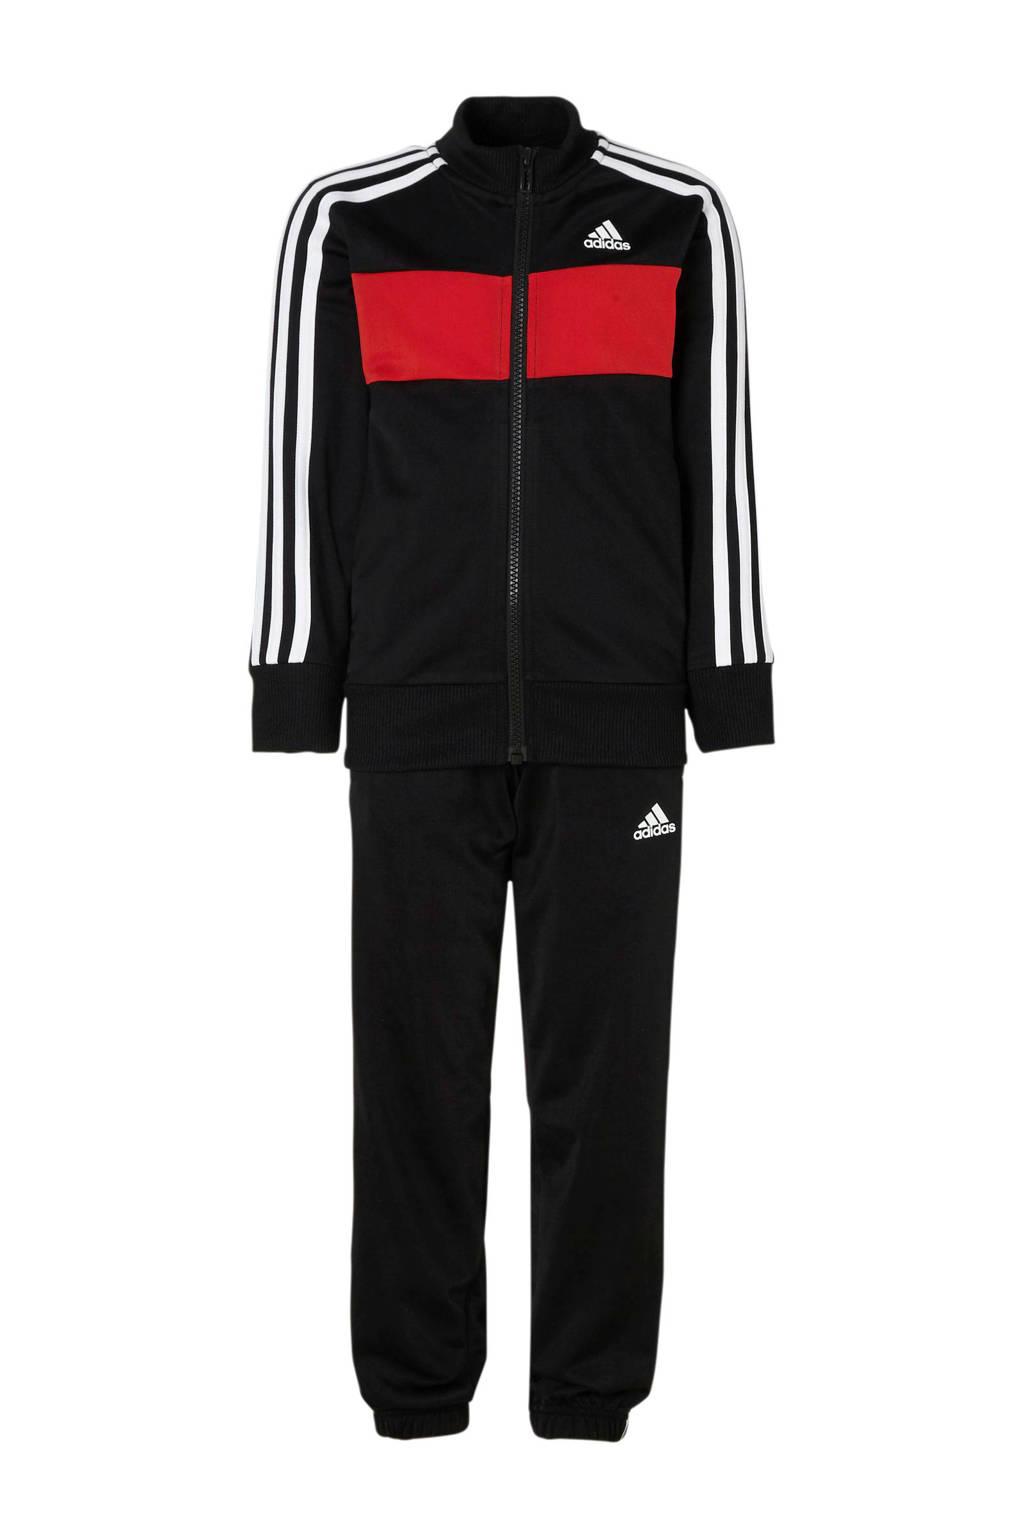 adidas performance   trainingspak, Zwart/rood/wit